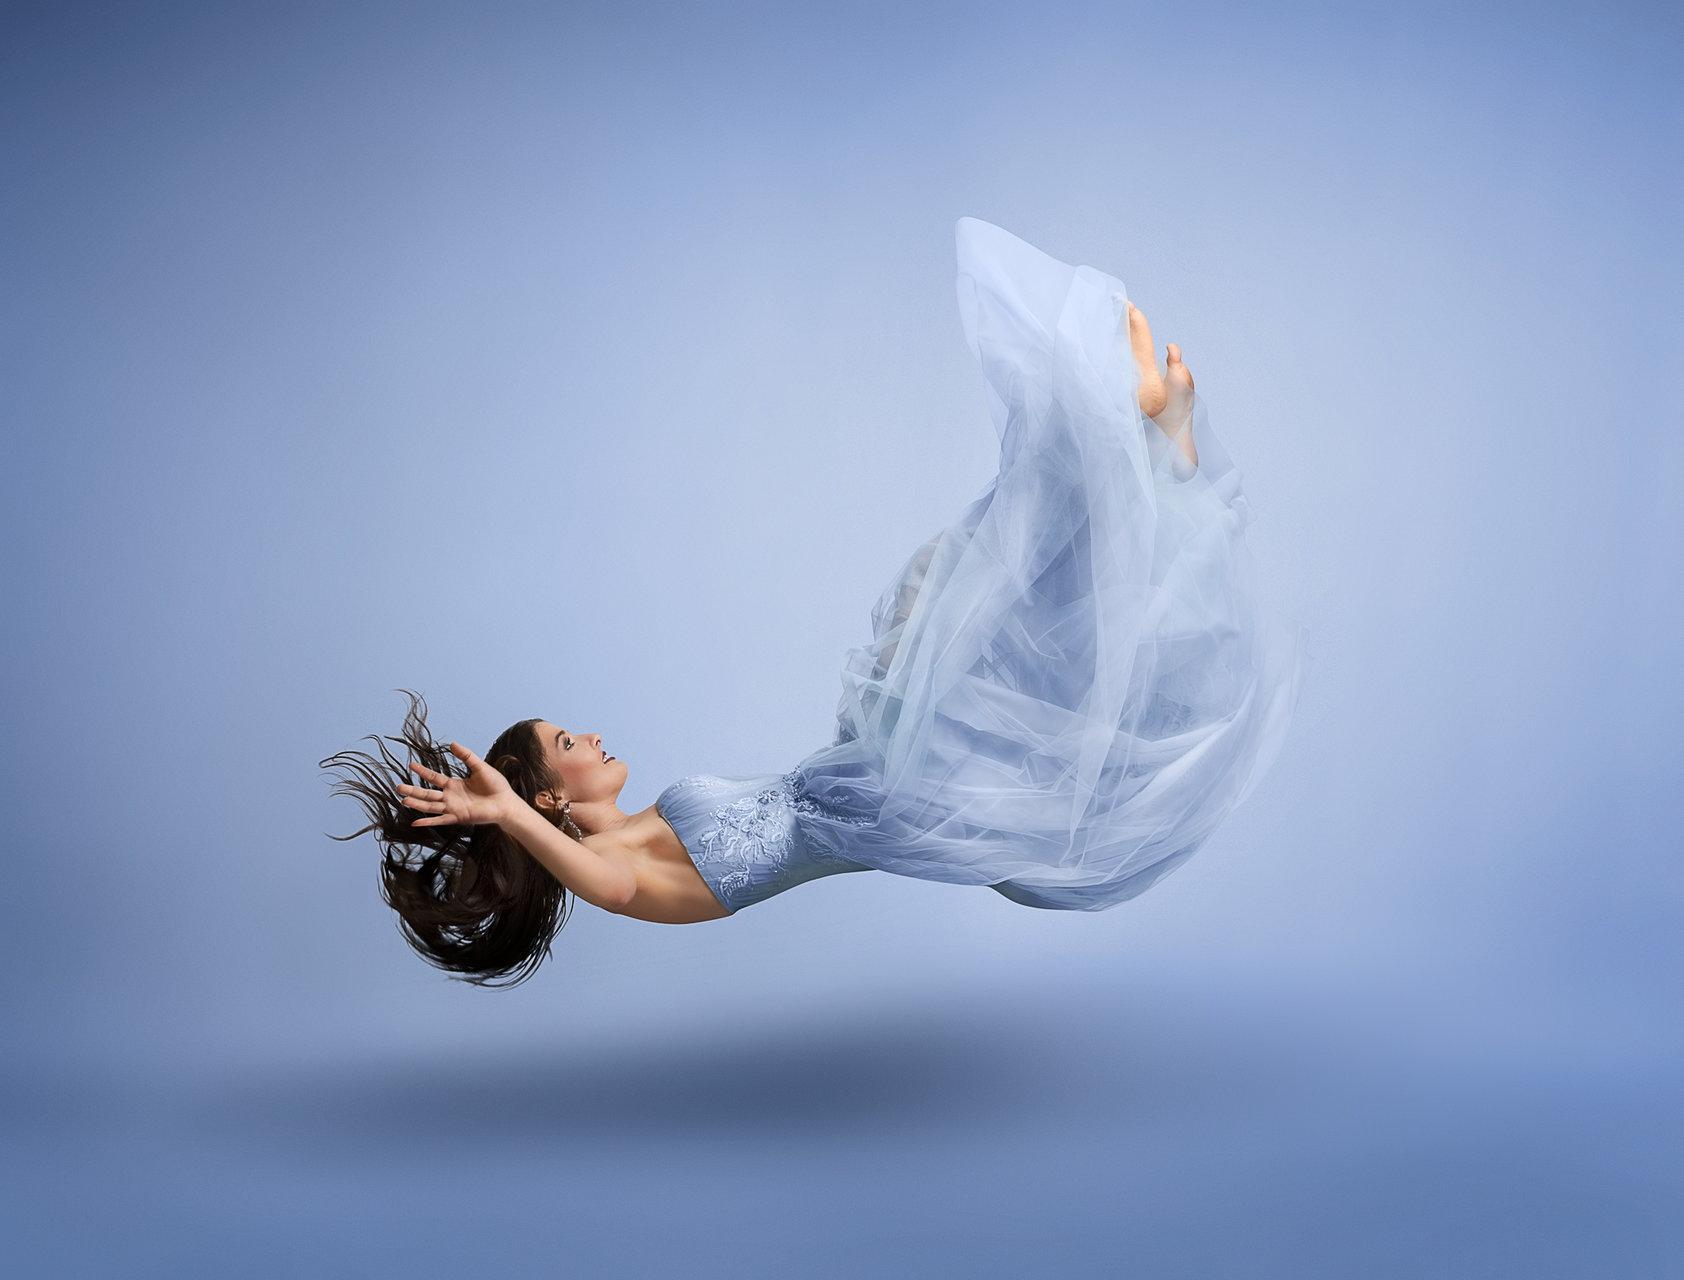 Levitation Experiment with Karina   Author barikn   PHOTO FORUM